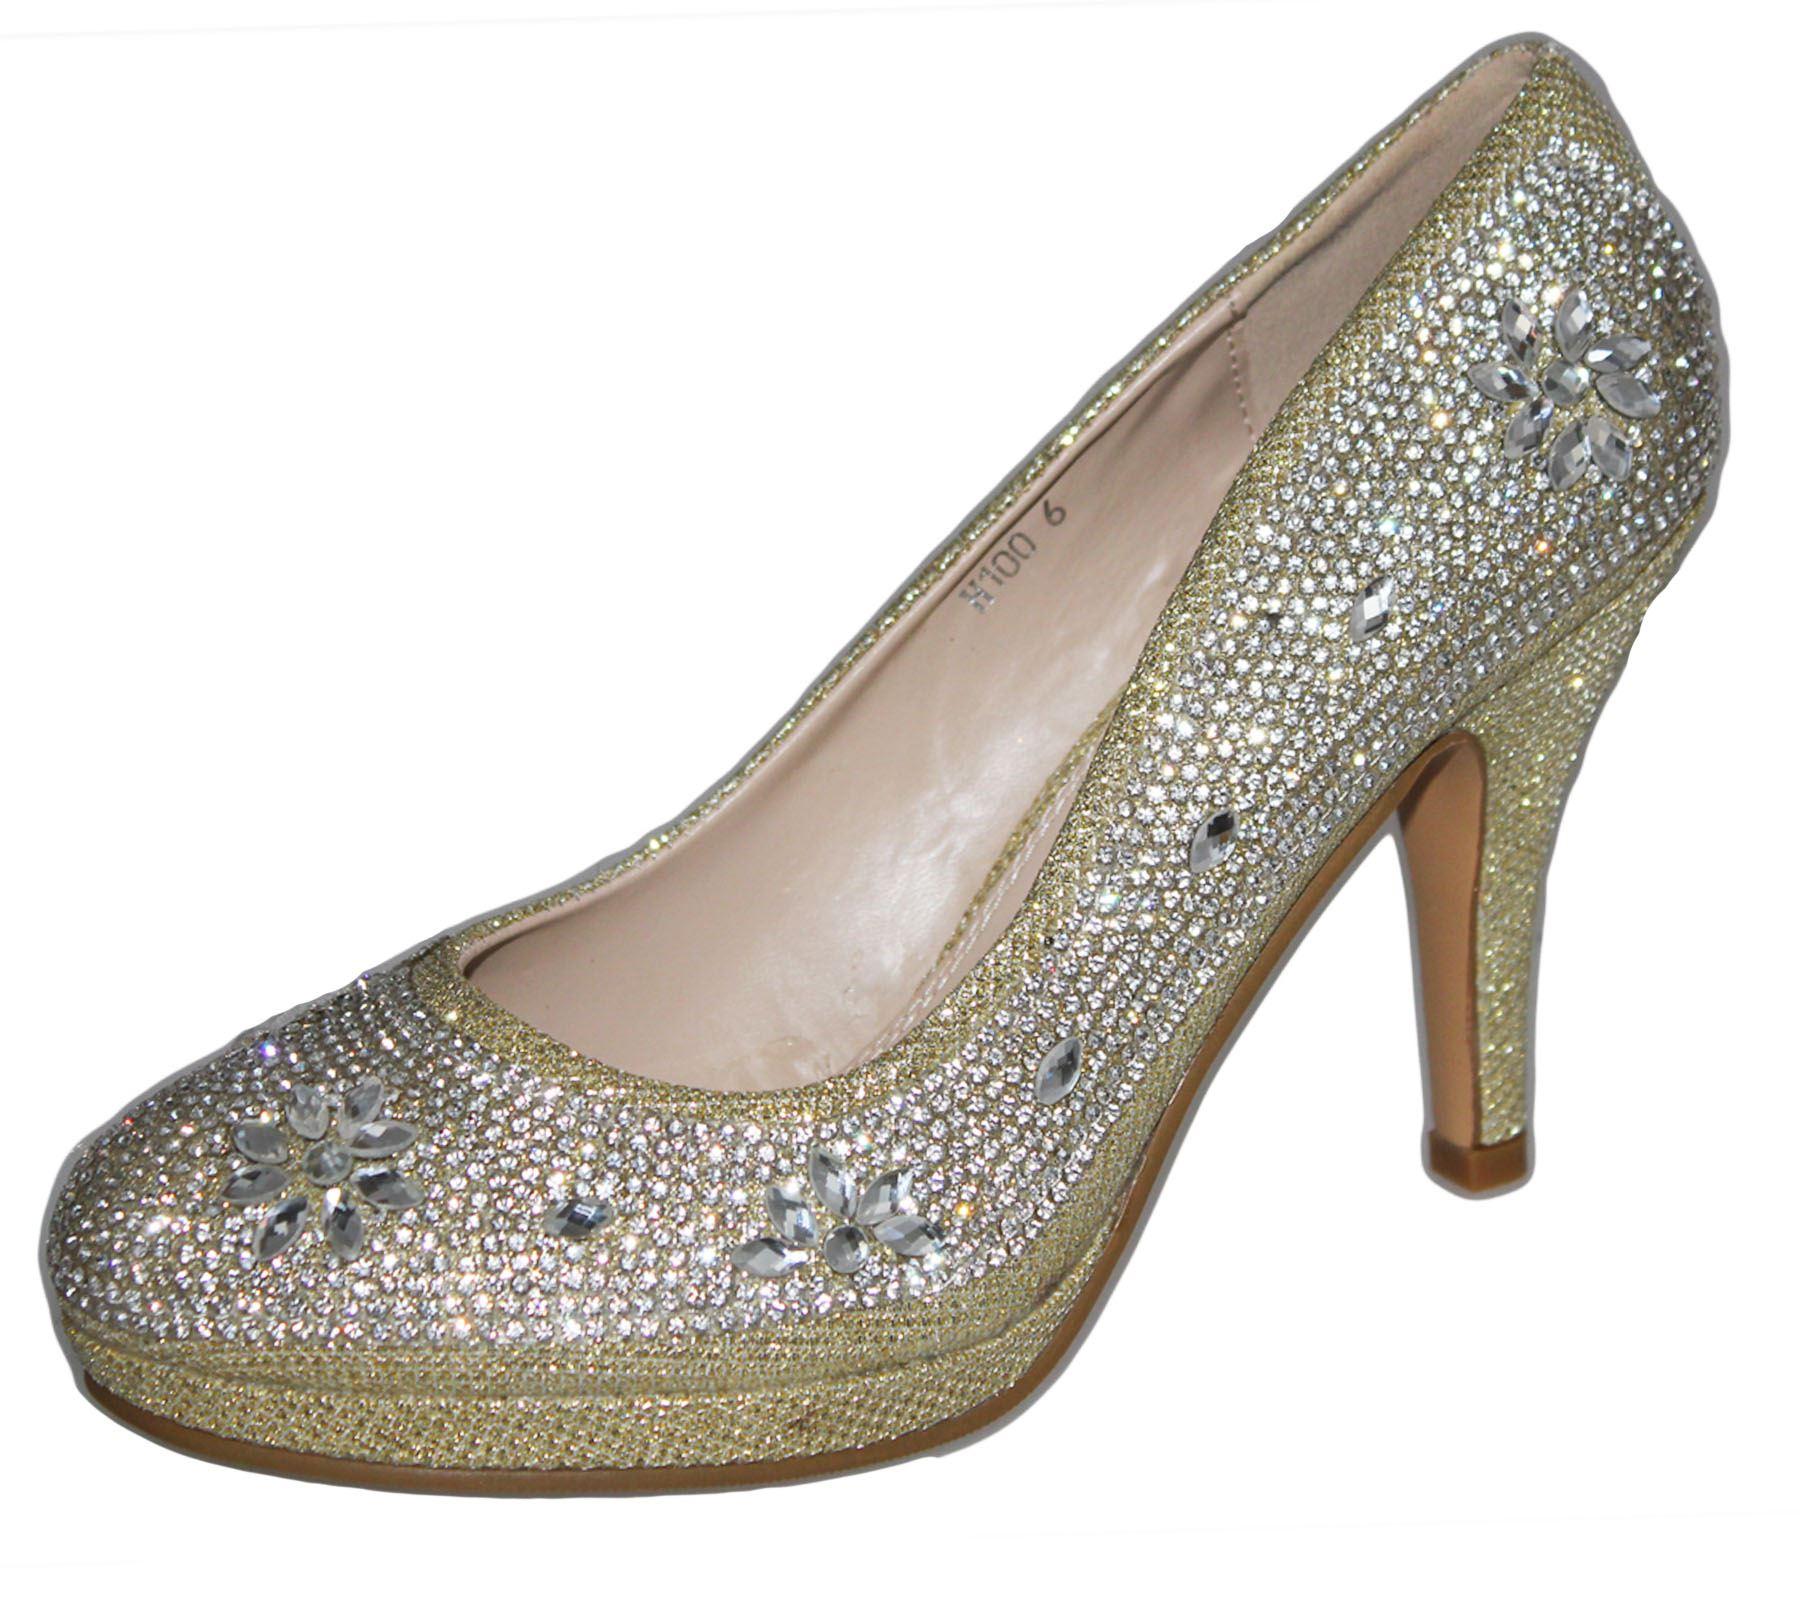 Womens-Platforms-High-Heels-Wedding-Bridal-Evening-Diamante-Ladies-Party-Shoes miniatura 26